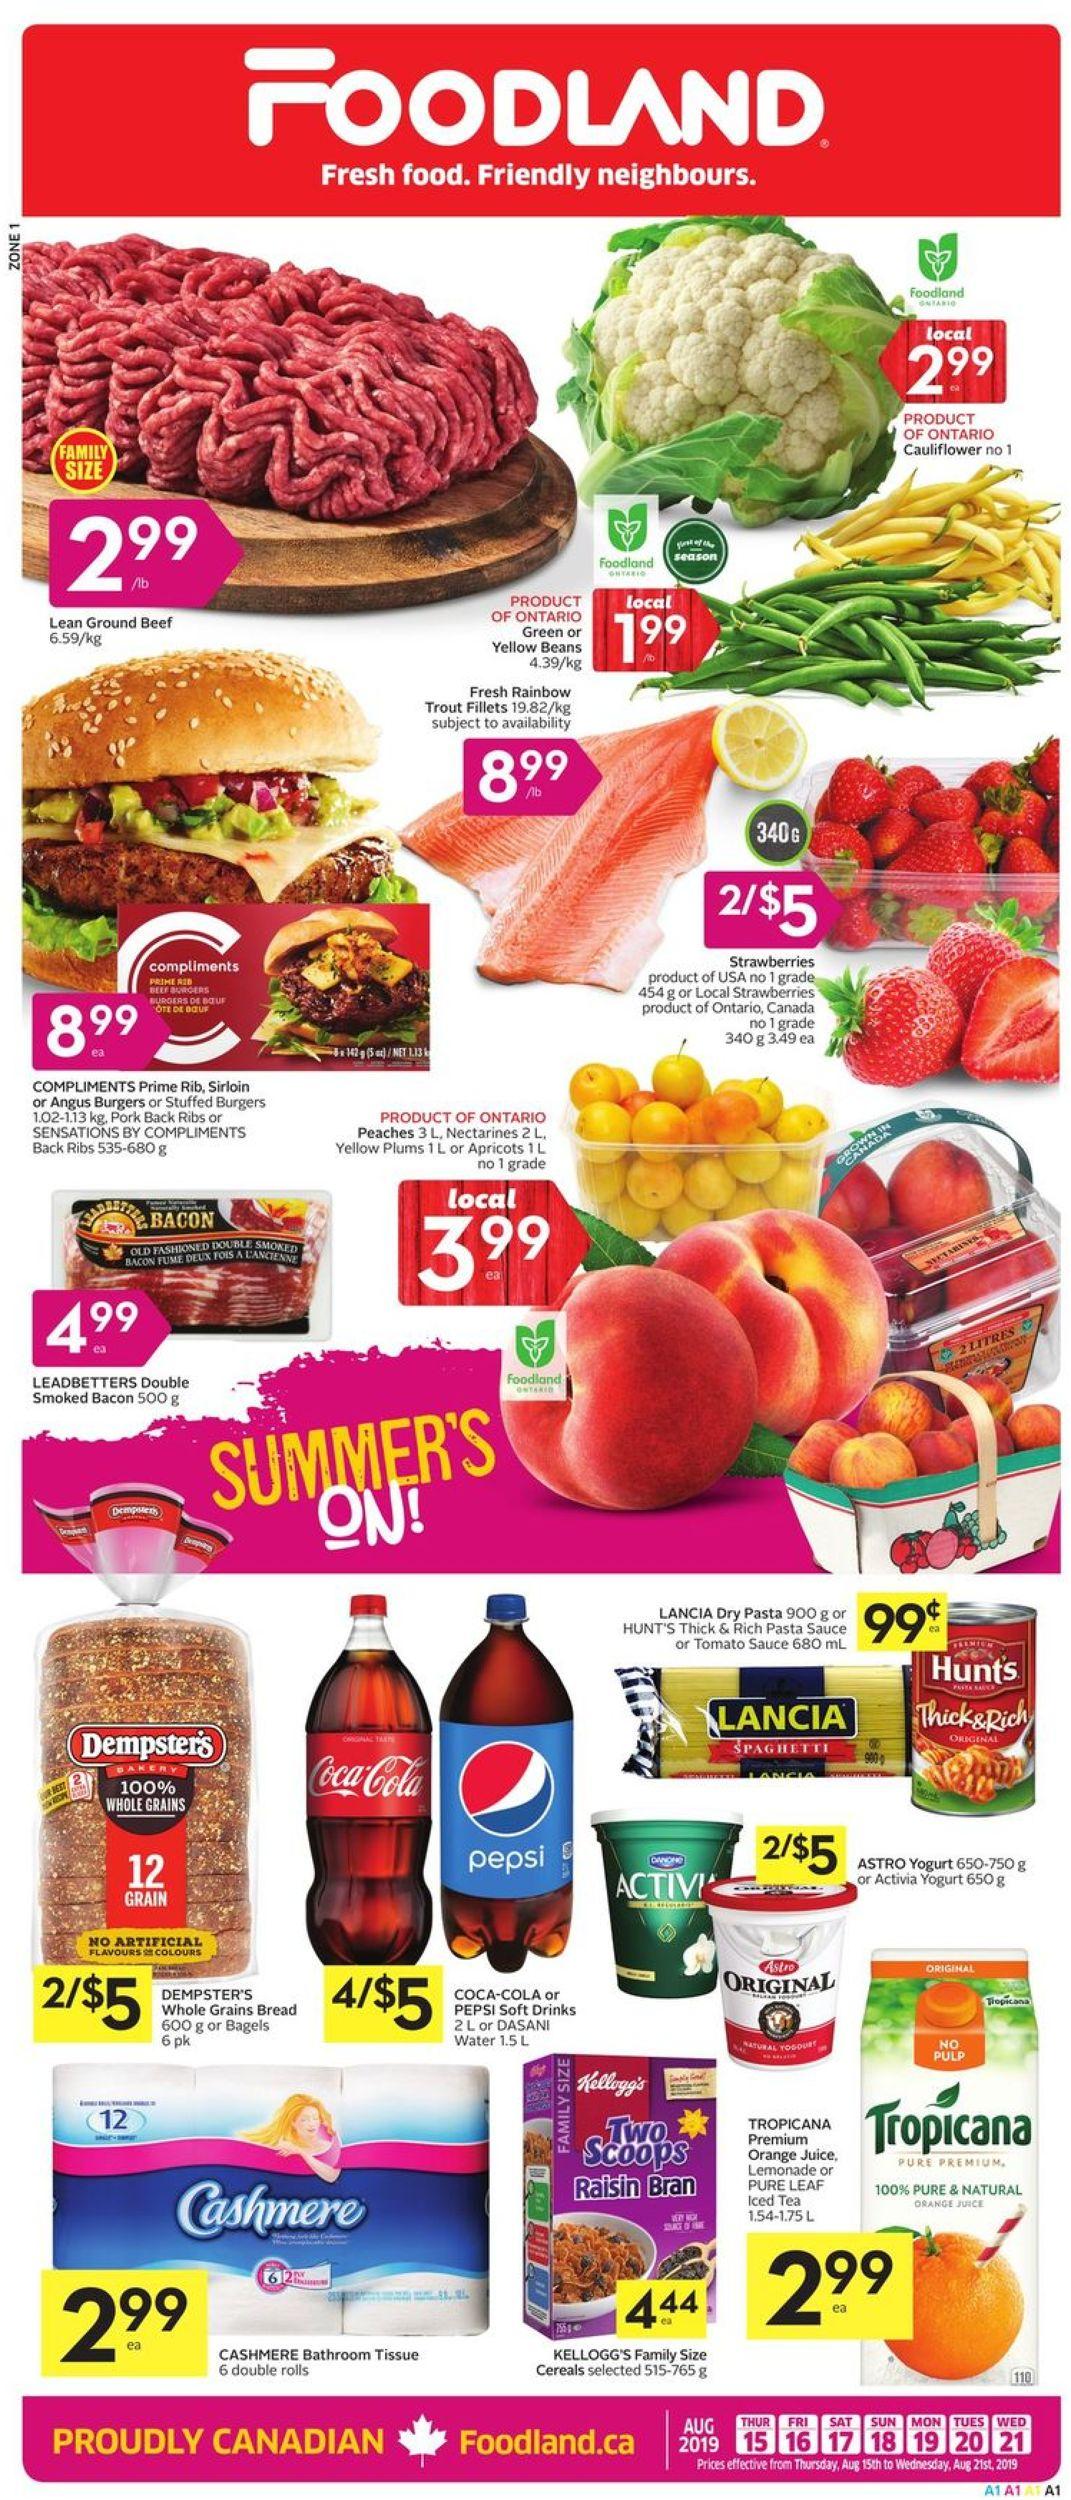 Foodland Flyer - 08/15-08/21/2019